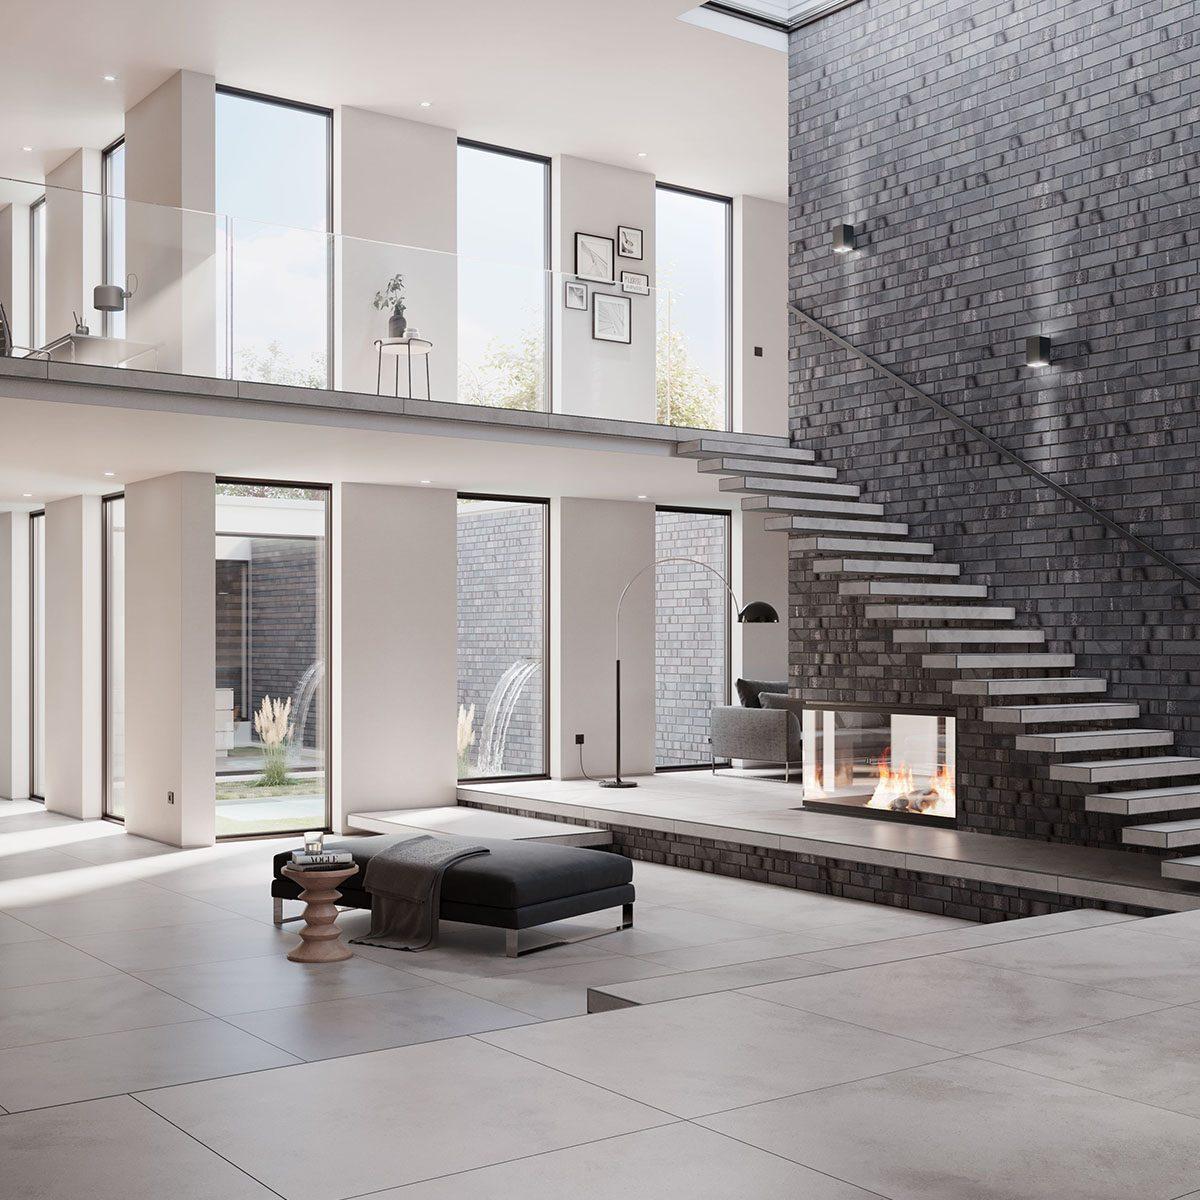 KLAY Tiles Facades - KLAY_KBS-SBR-2109-Ashen-Grey-2